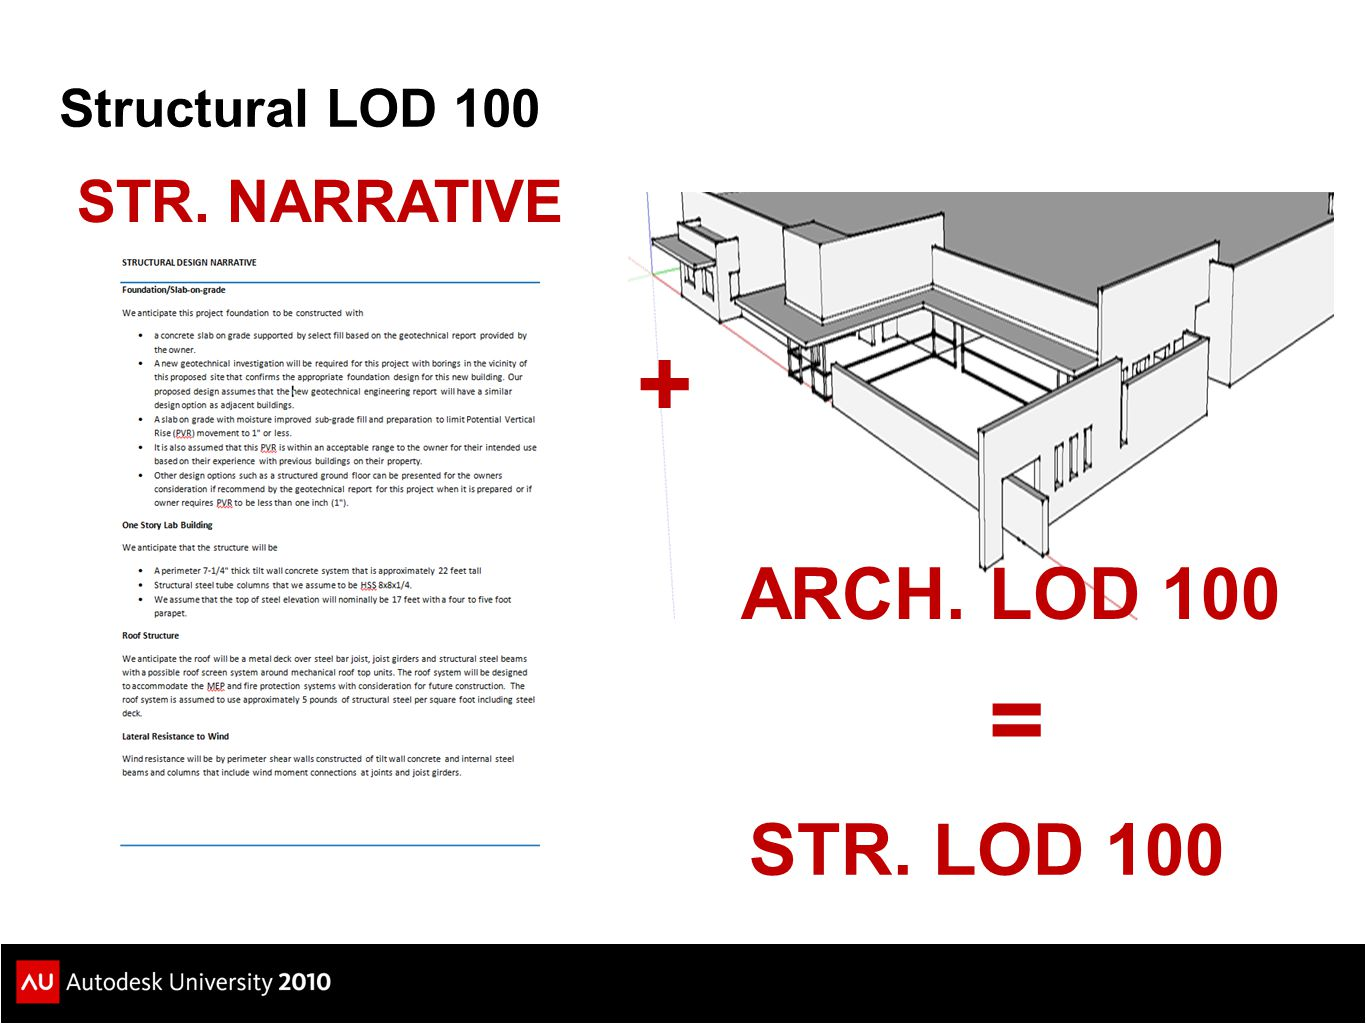 Structural LOD 100 STR. NARRATIVE ARCH. LOD 100 + = STR. LOD 100